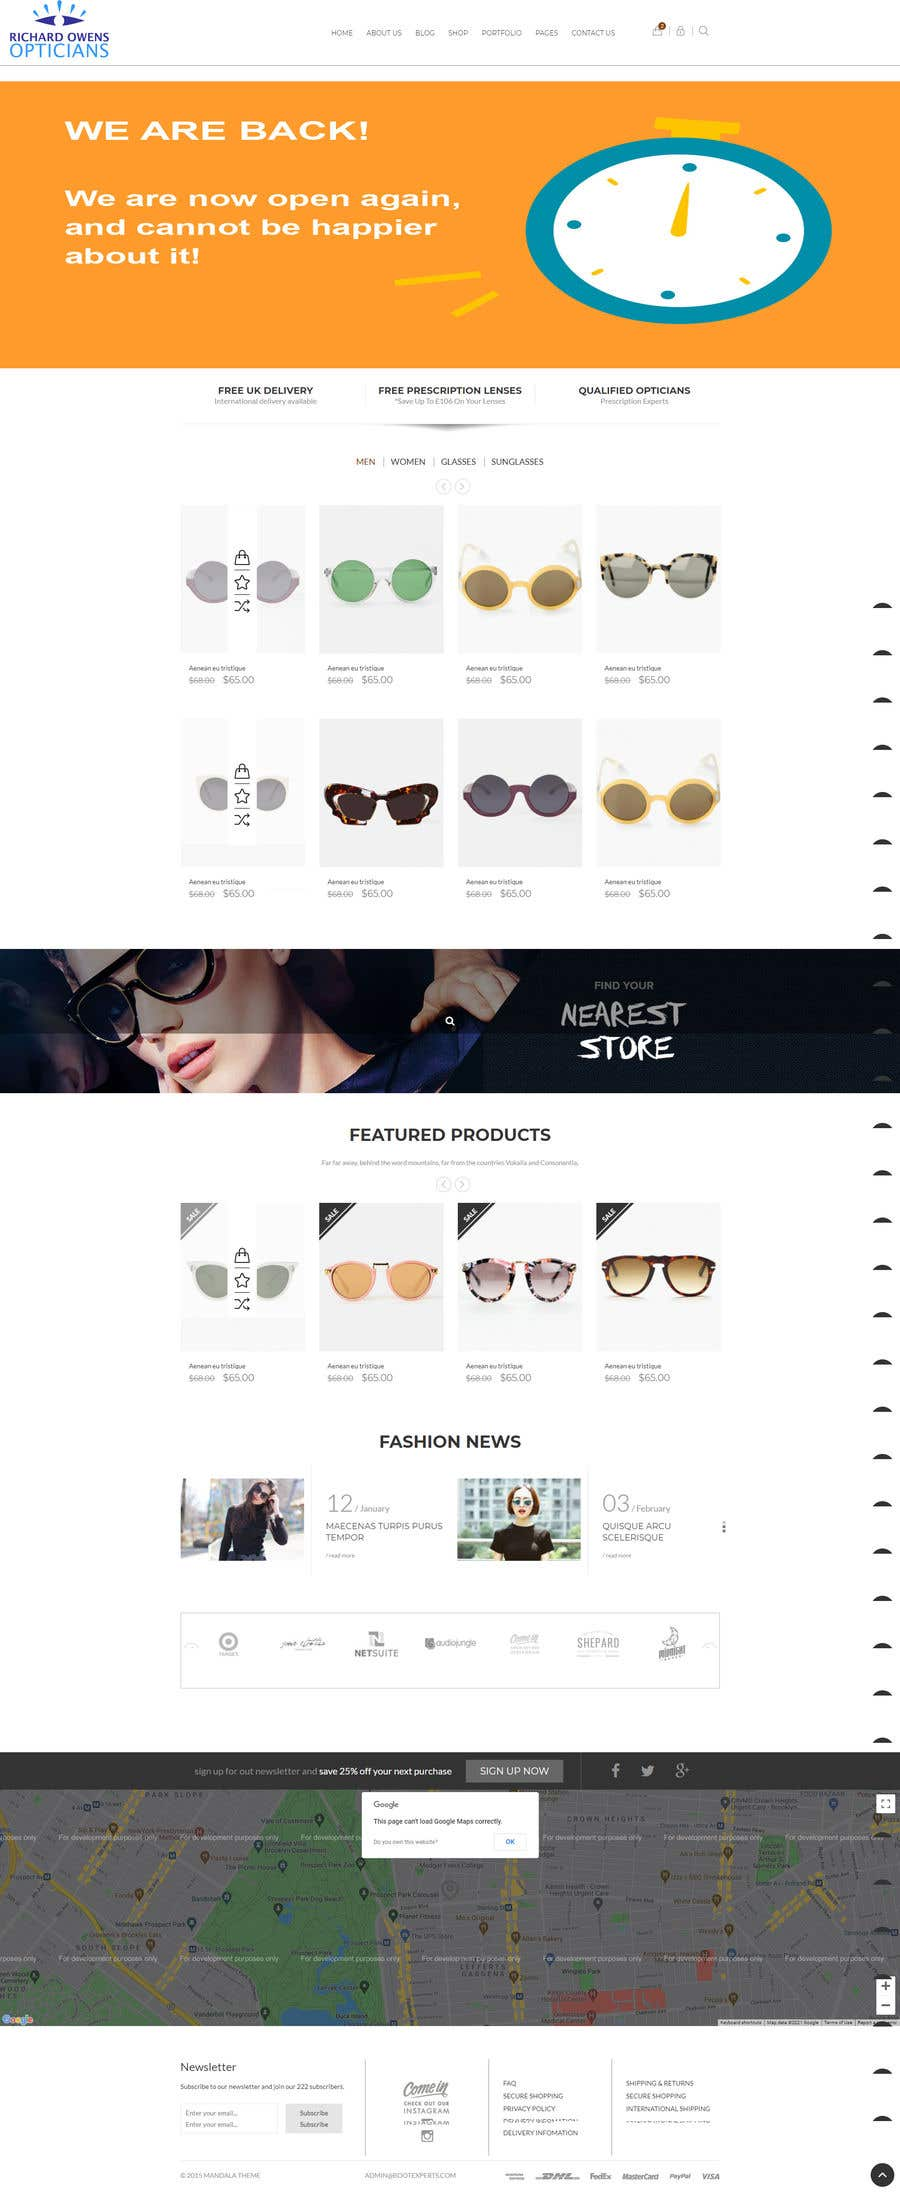 Konkurrenceindlæg #                                        24                                      for                                         Design an online shopping page for my website